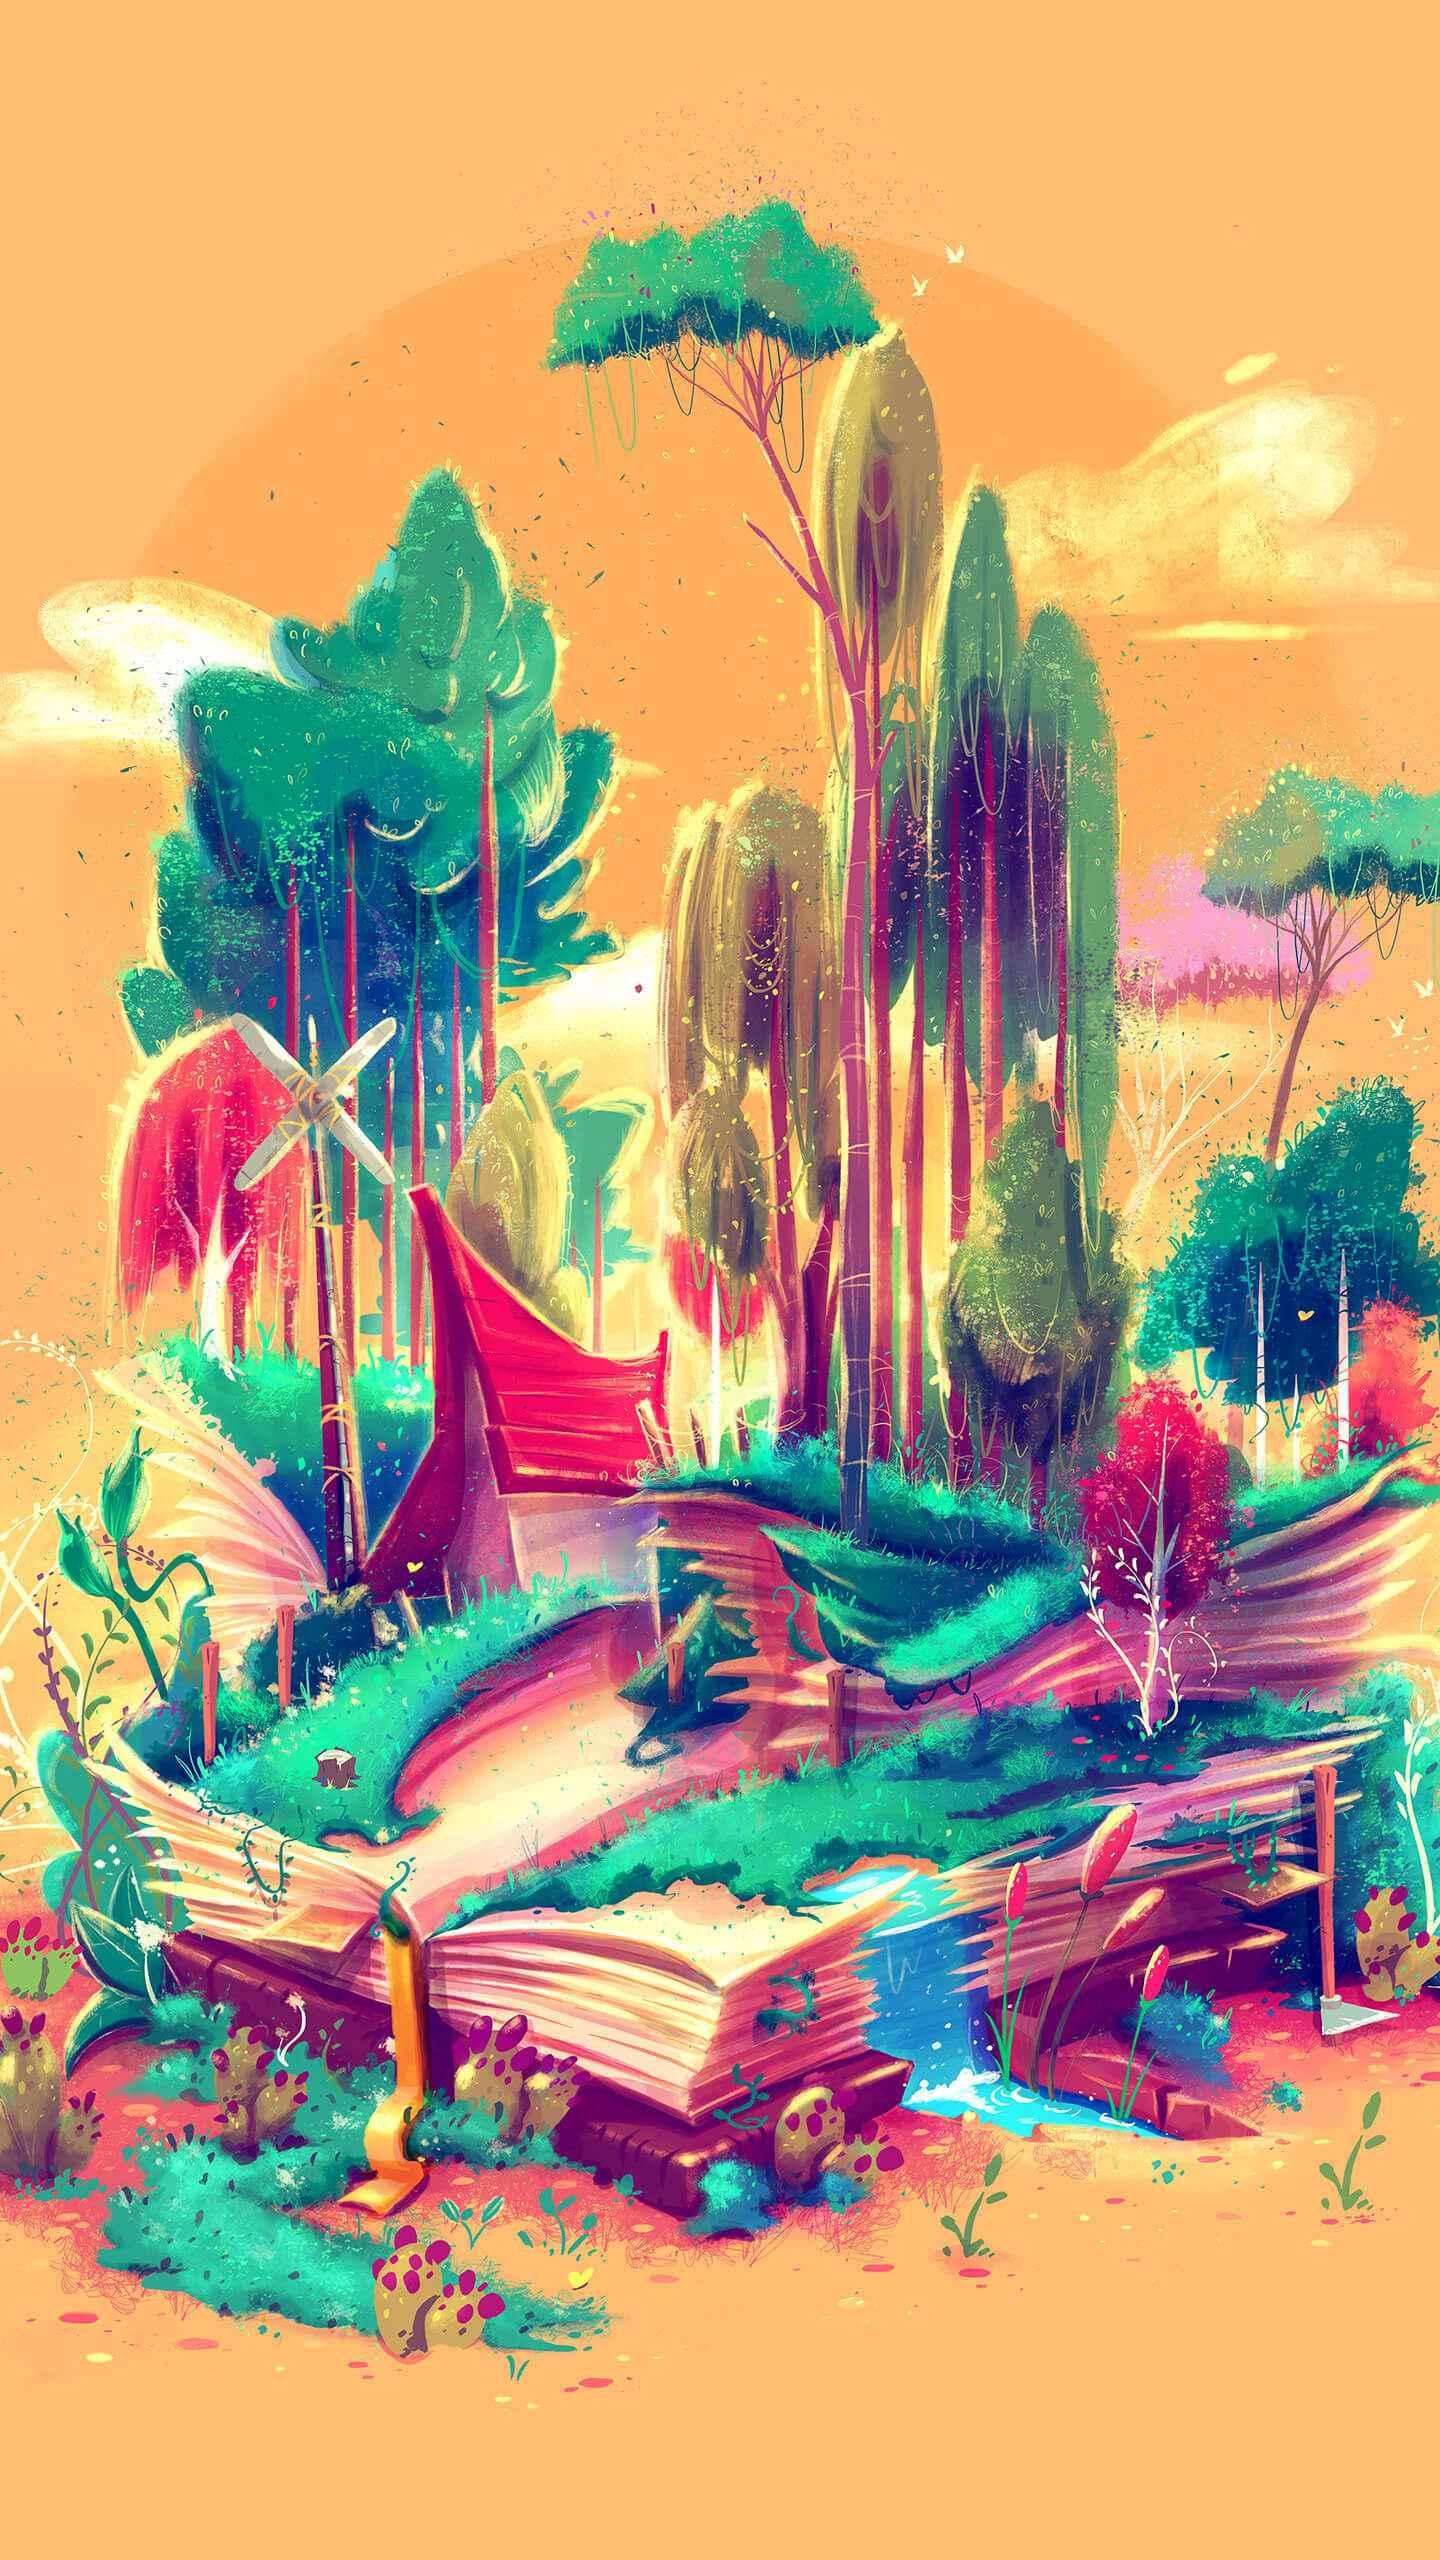 Artistic Nature iPhone Wallpaper